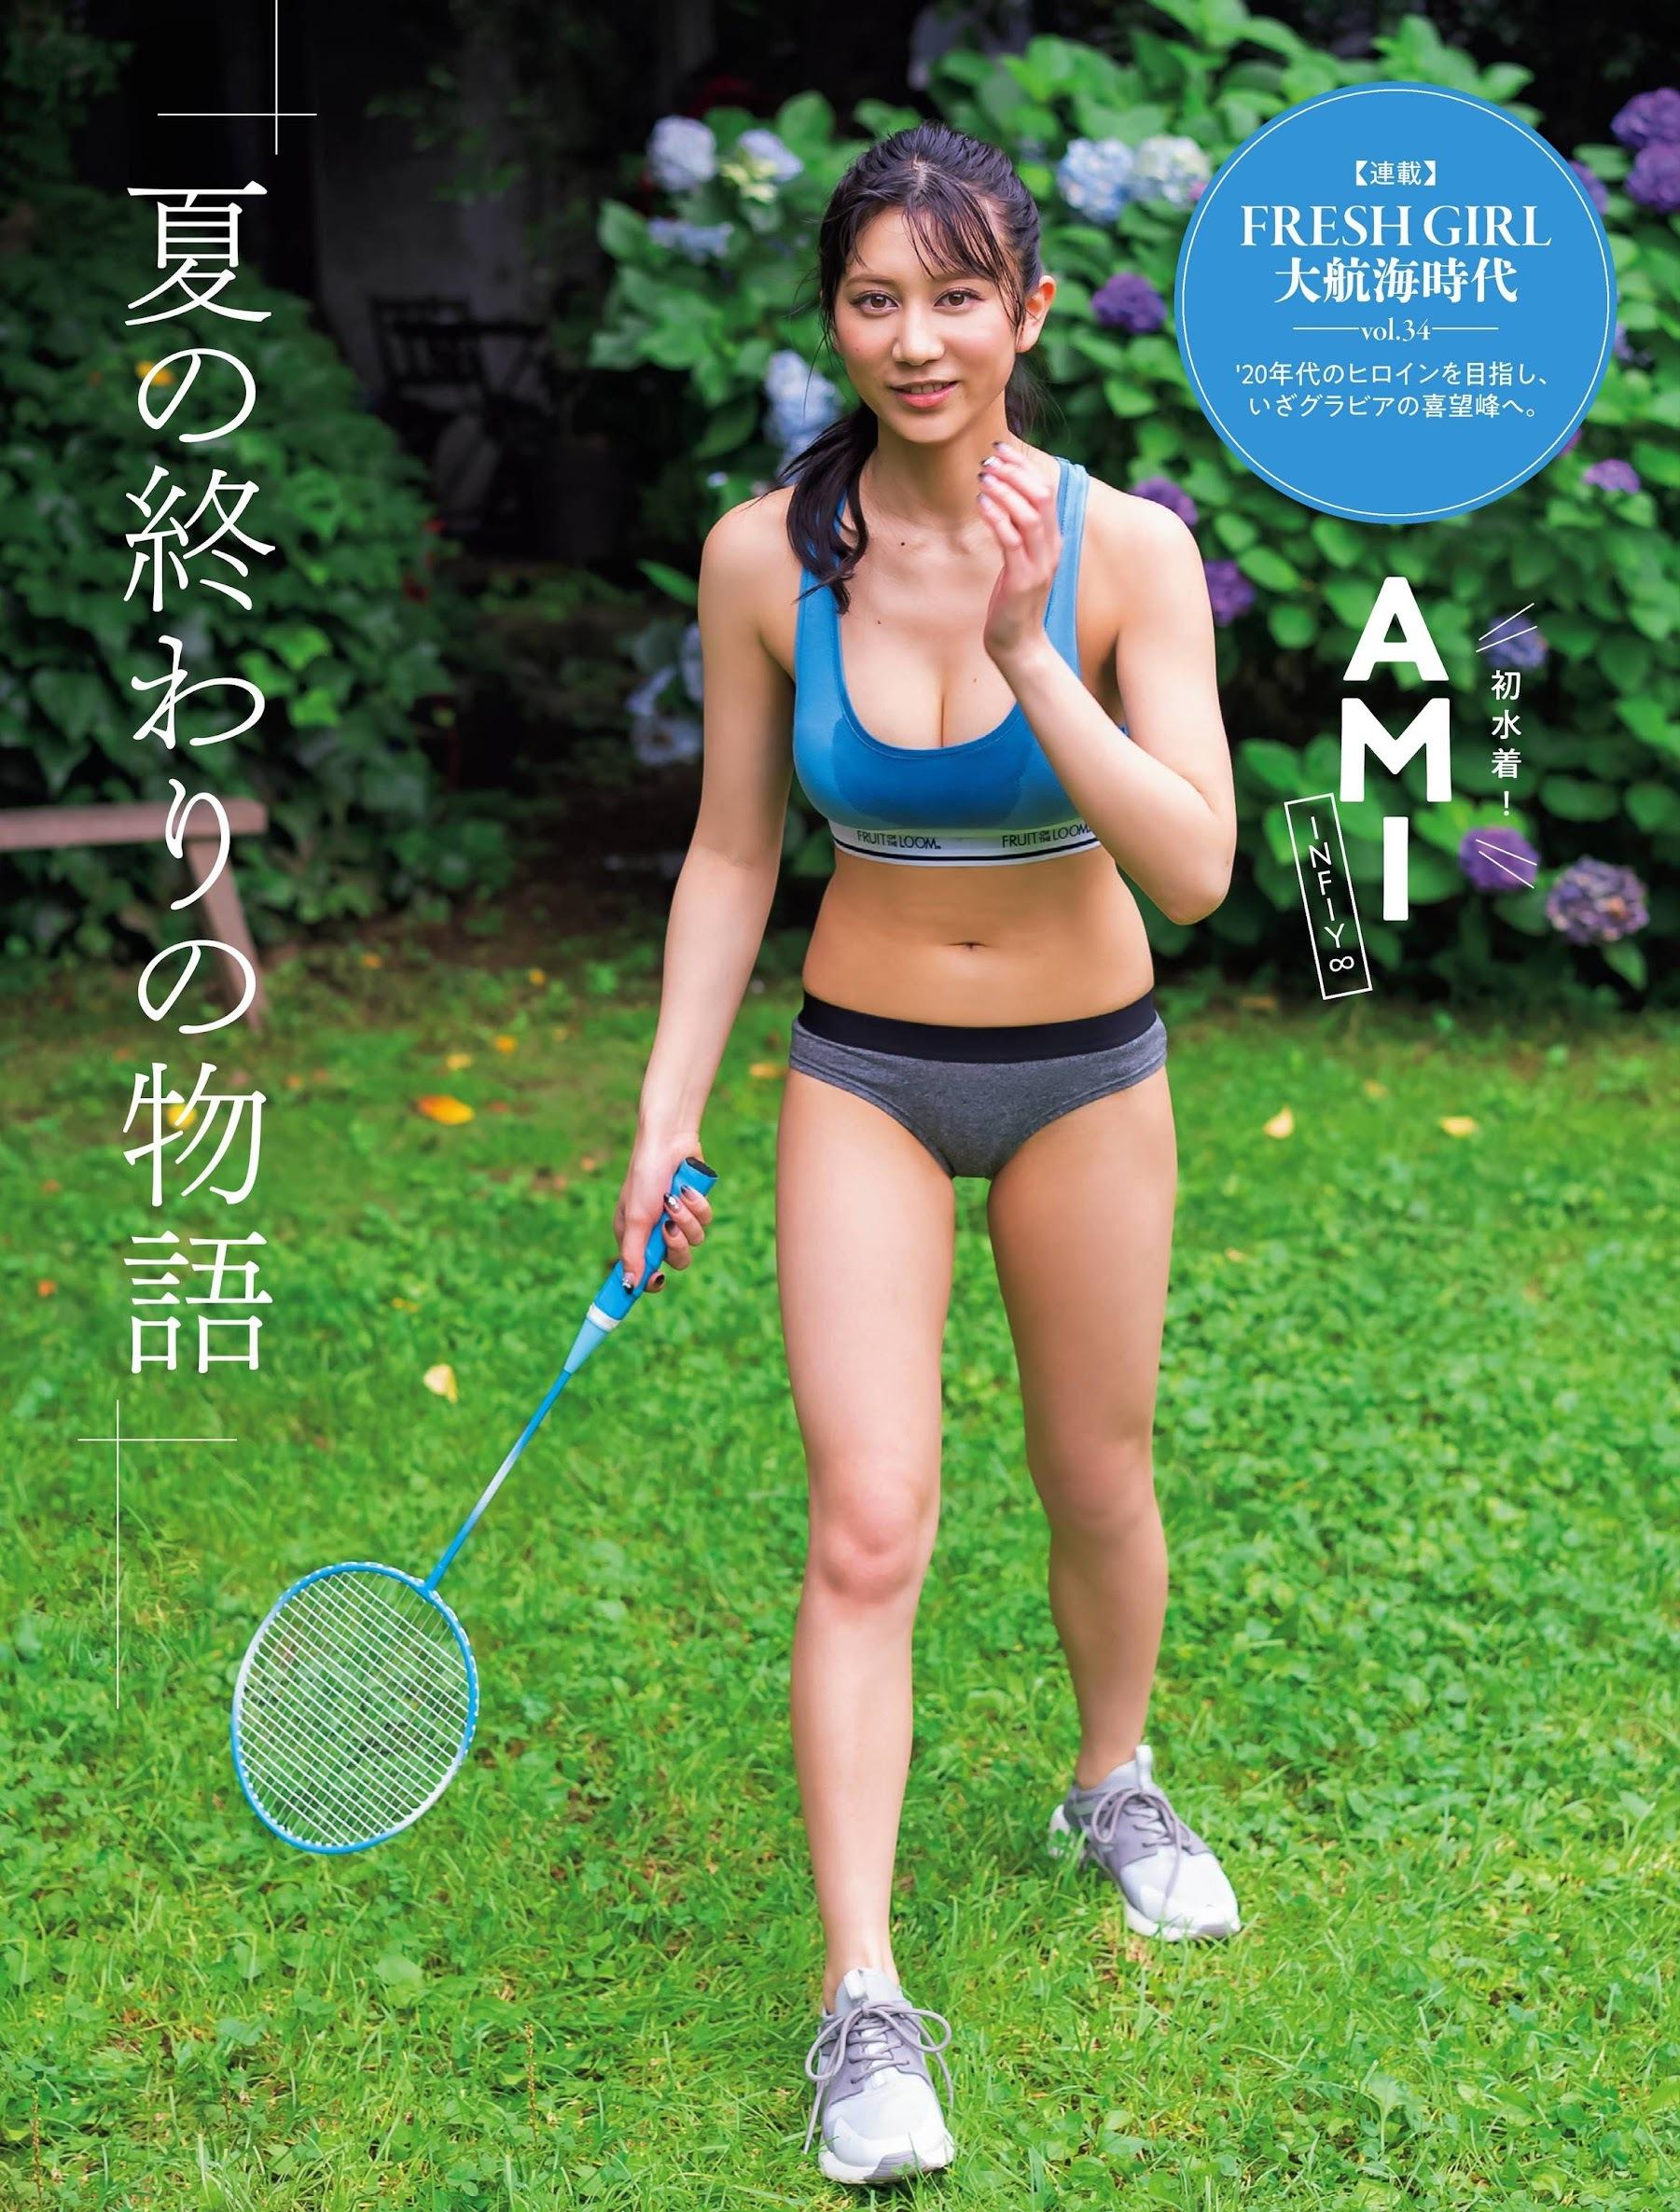 enako 雪平莉左-FLASH 2021年9月14日刊 高清套图 第30张